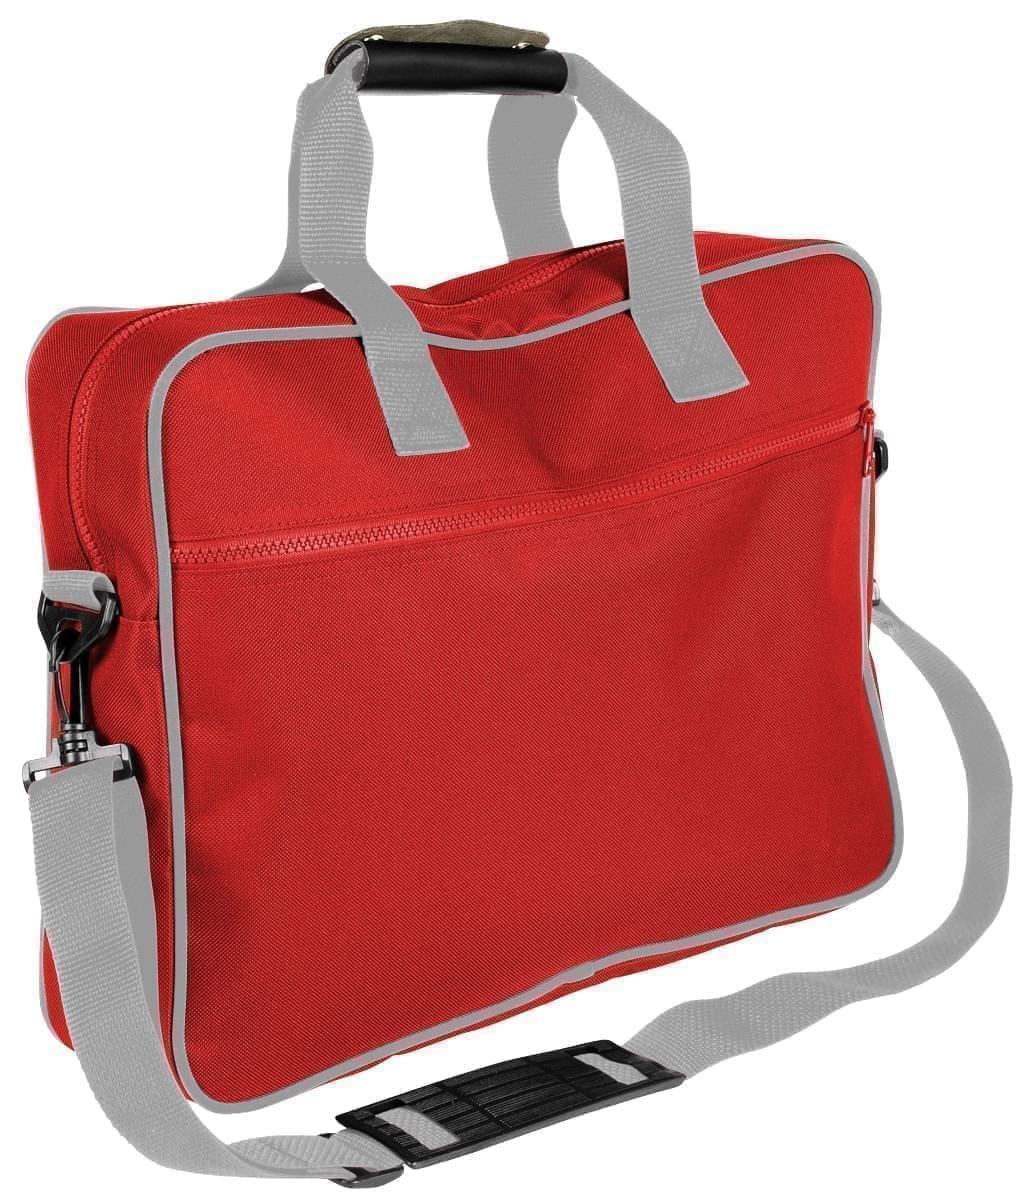 USA Made Nylon Poly Notebook Sleeves, Red-Grey, CPKVA59PZU